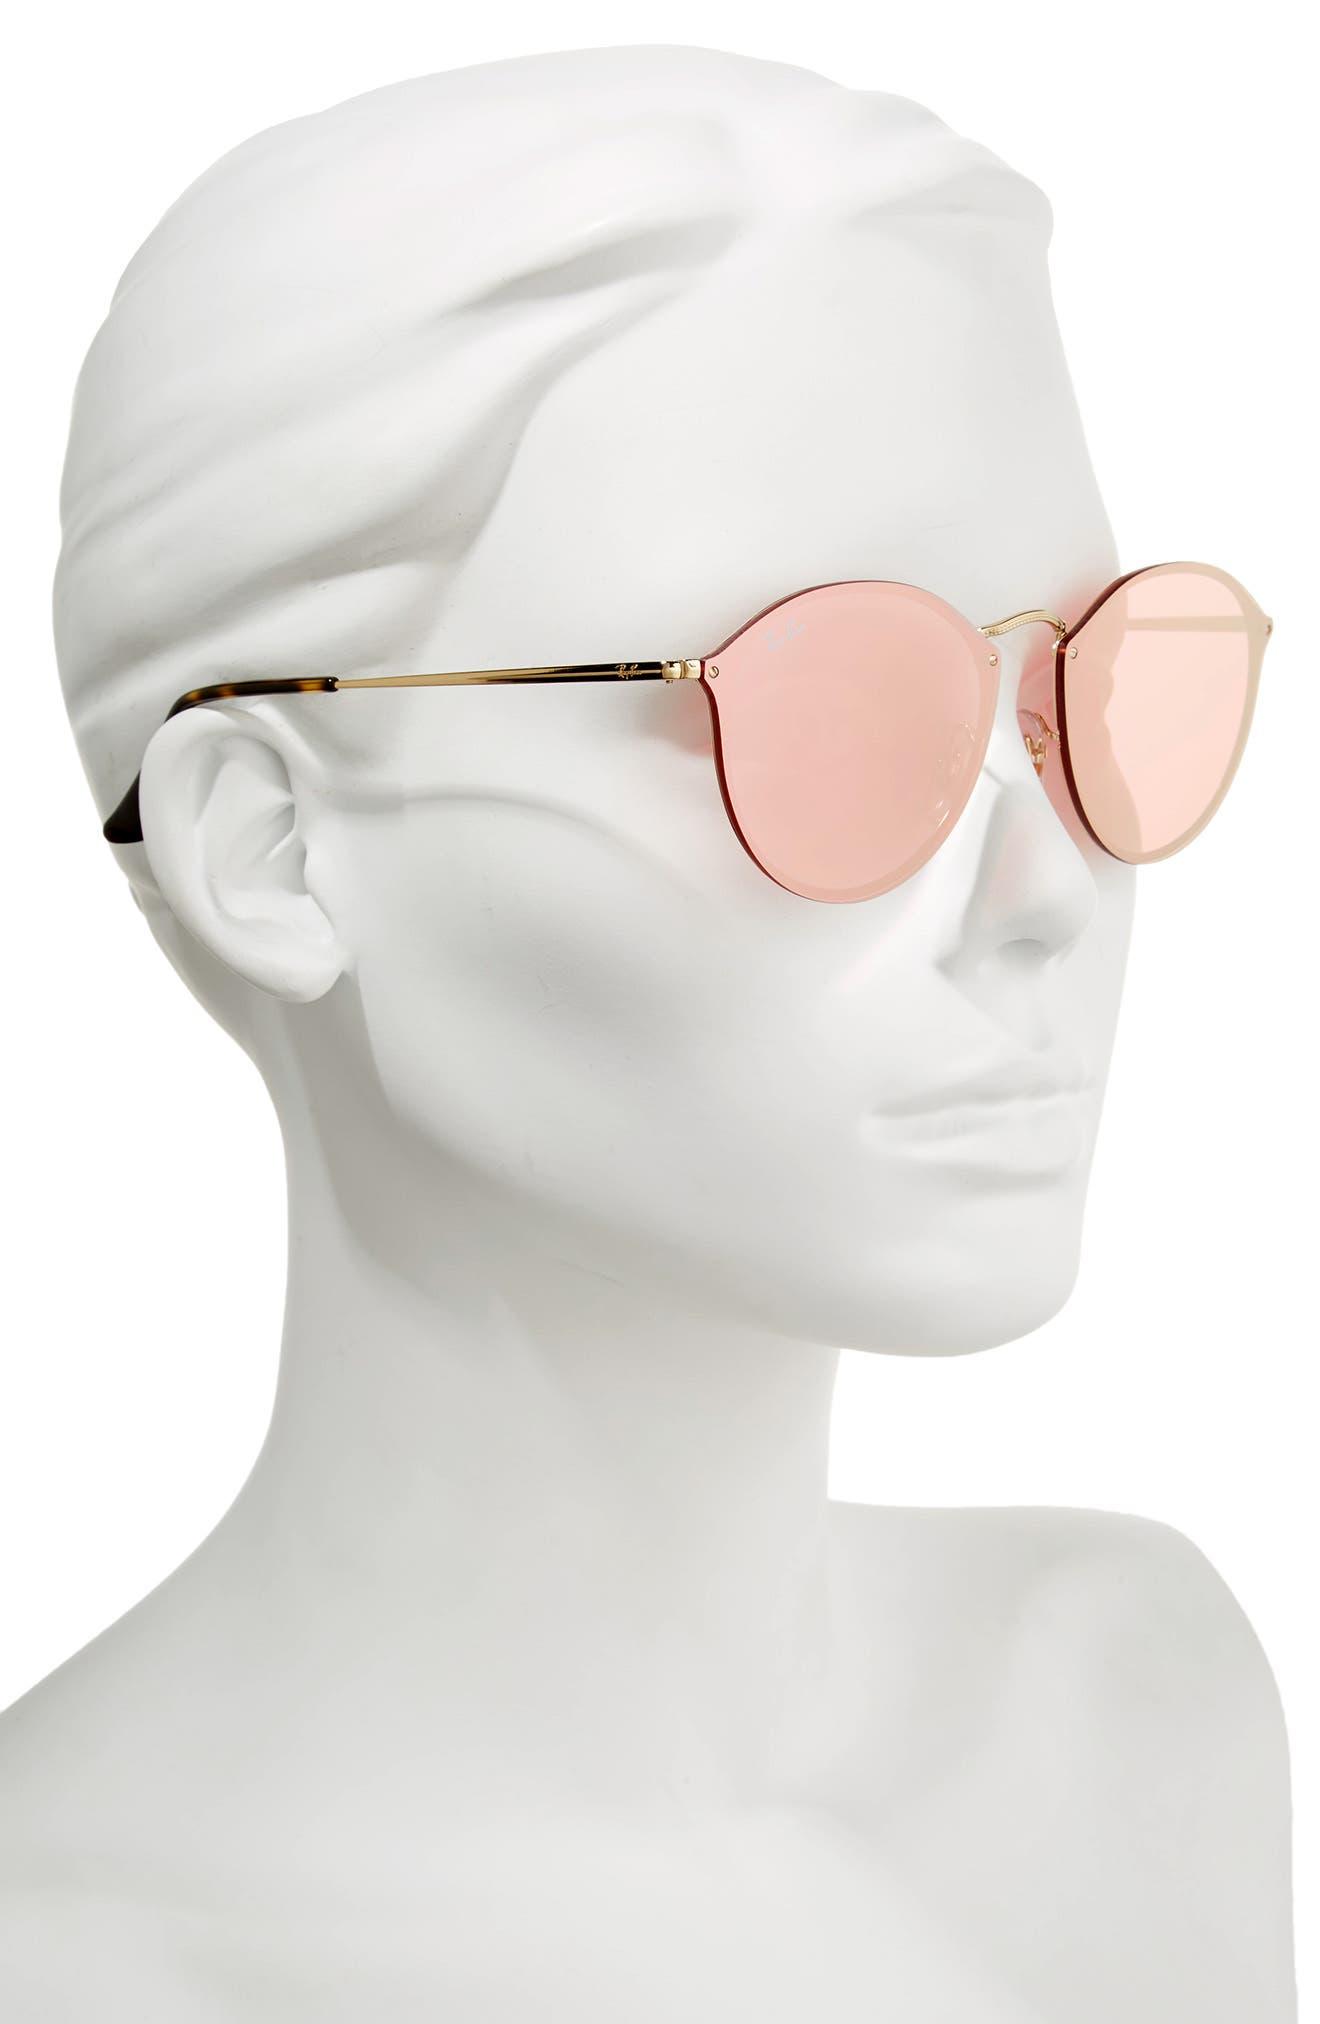 59mm Blaze Round Mirrored Sunglasses,                             Alternate thumbnail 8, color,